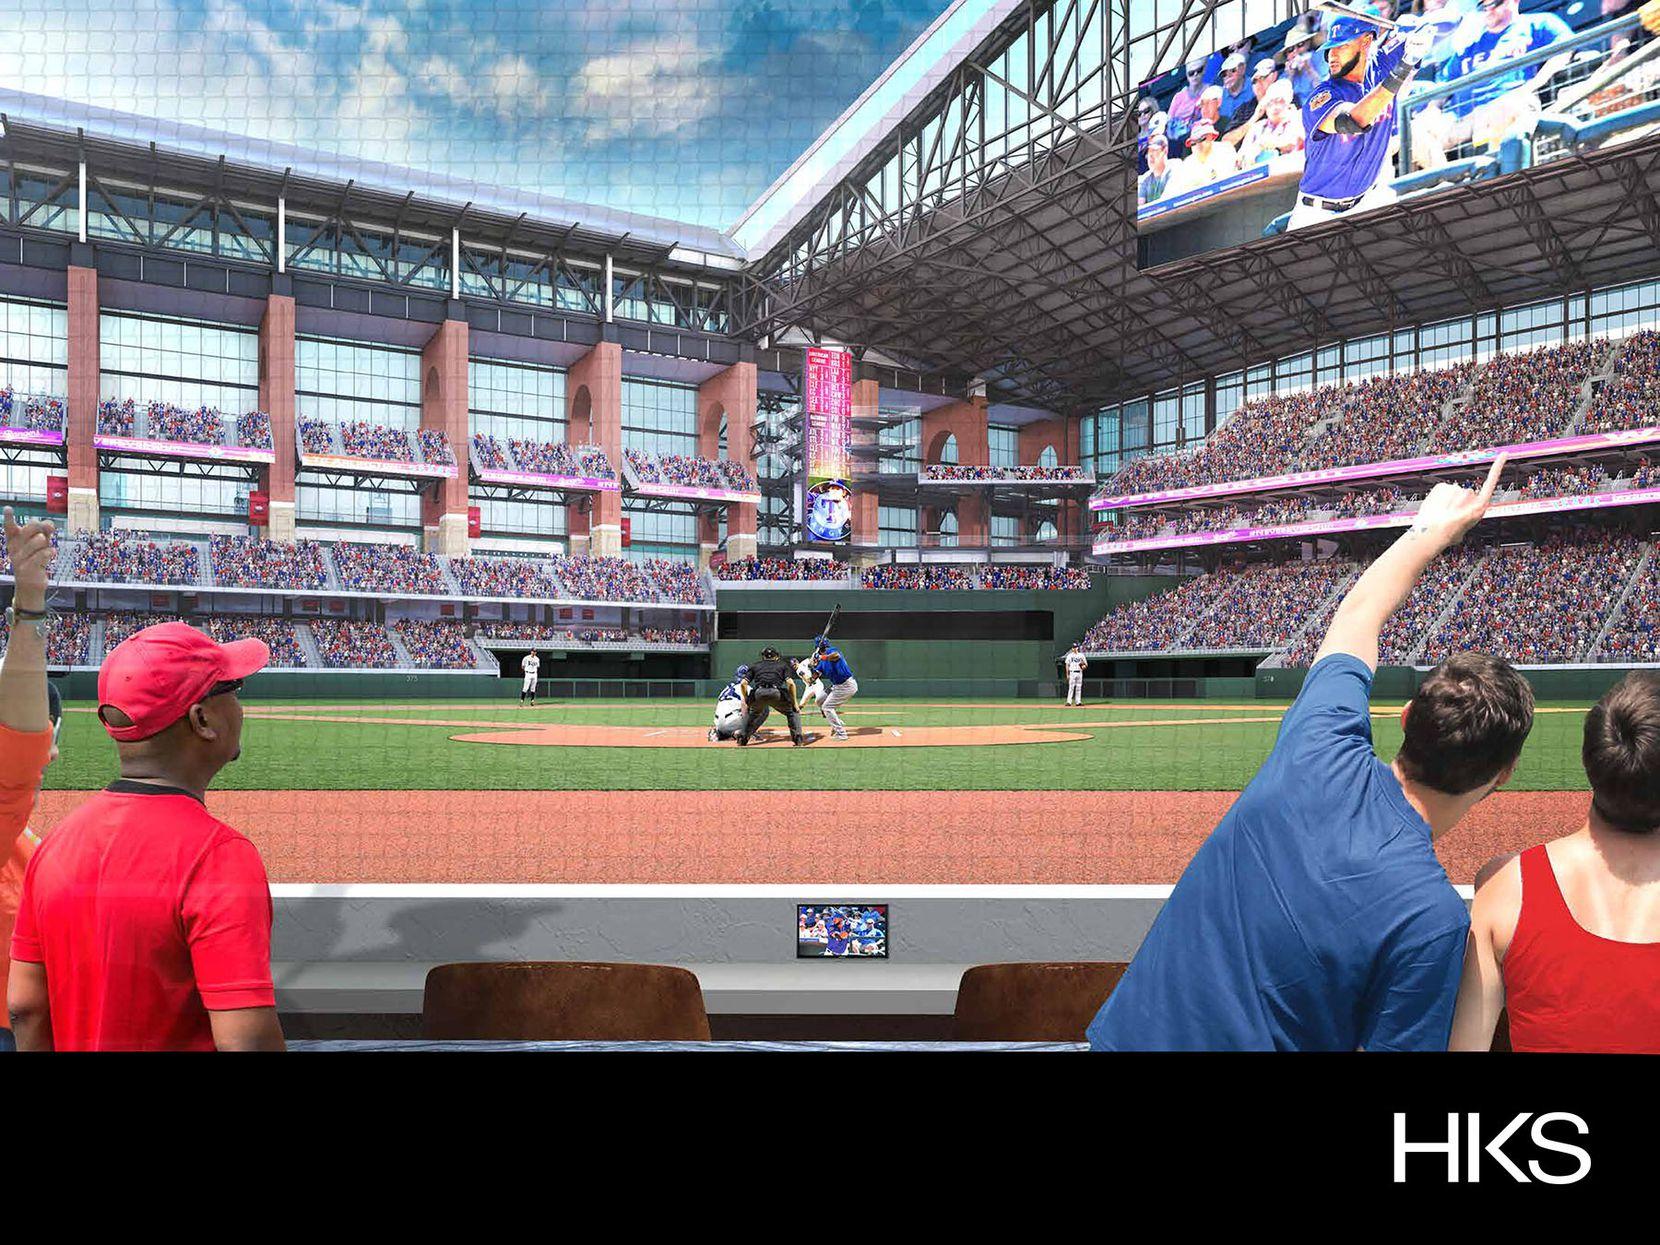 Rendering via The Texas Rangers.